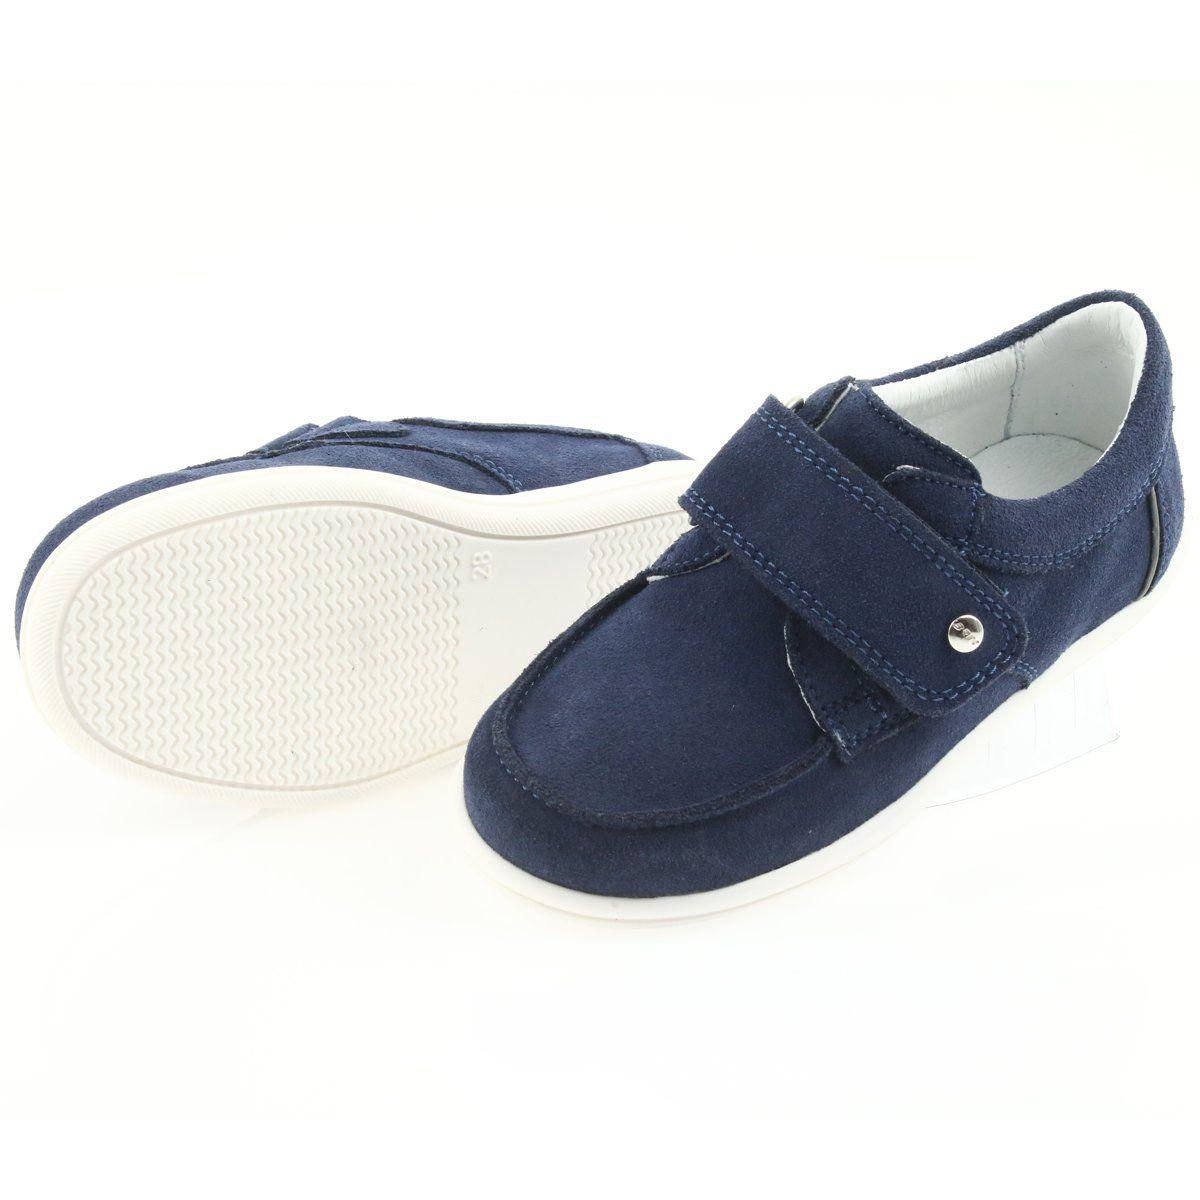 Bartek Polbuty Casualowe Chlopiece 55599 Granat Granatowe Boys Casual Shoes Childrens Shoes Casual Shoes